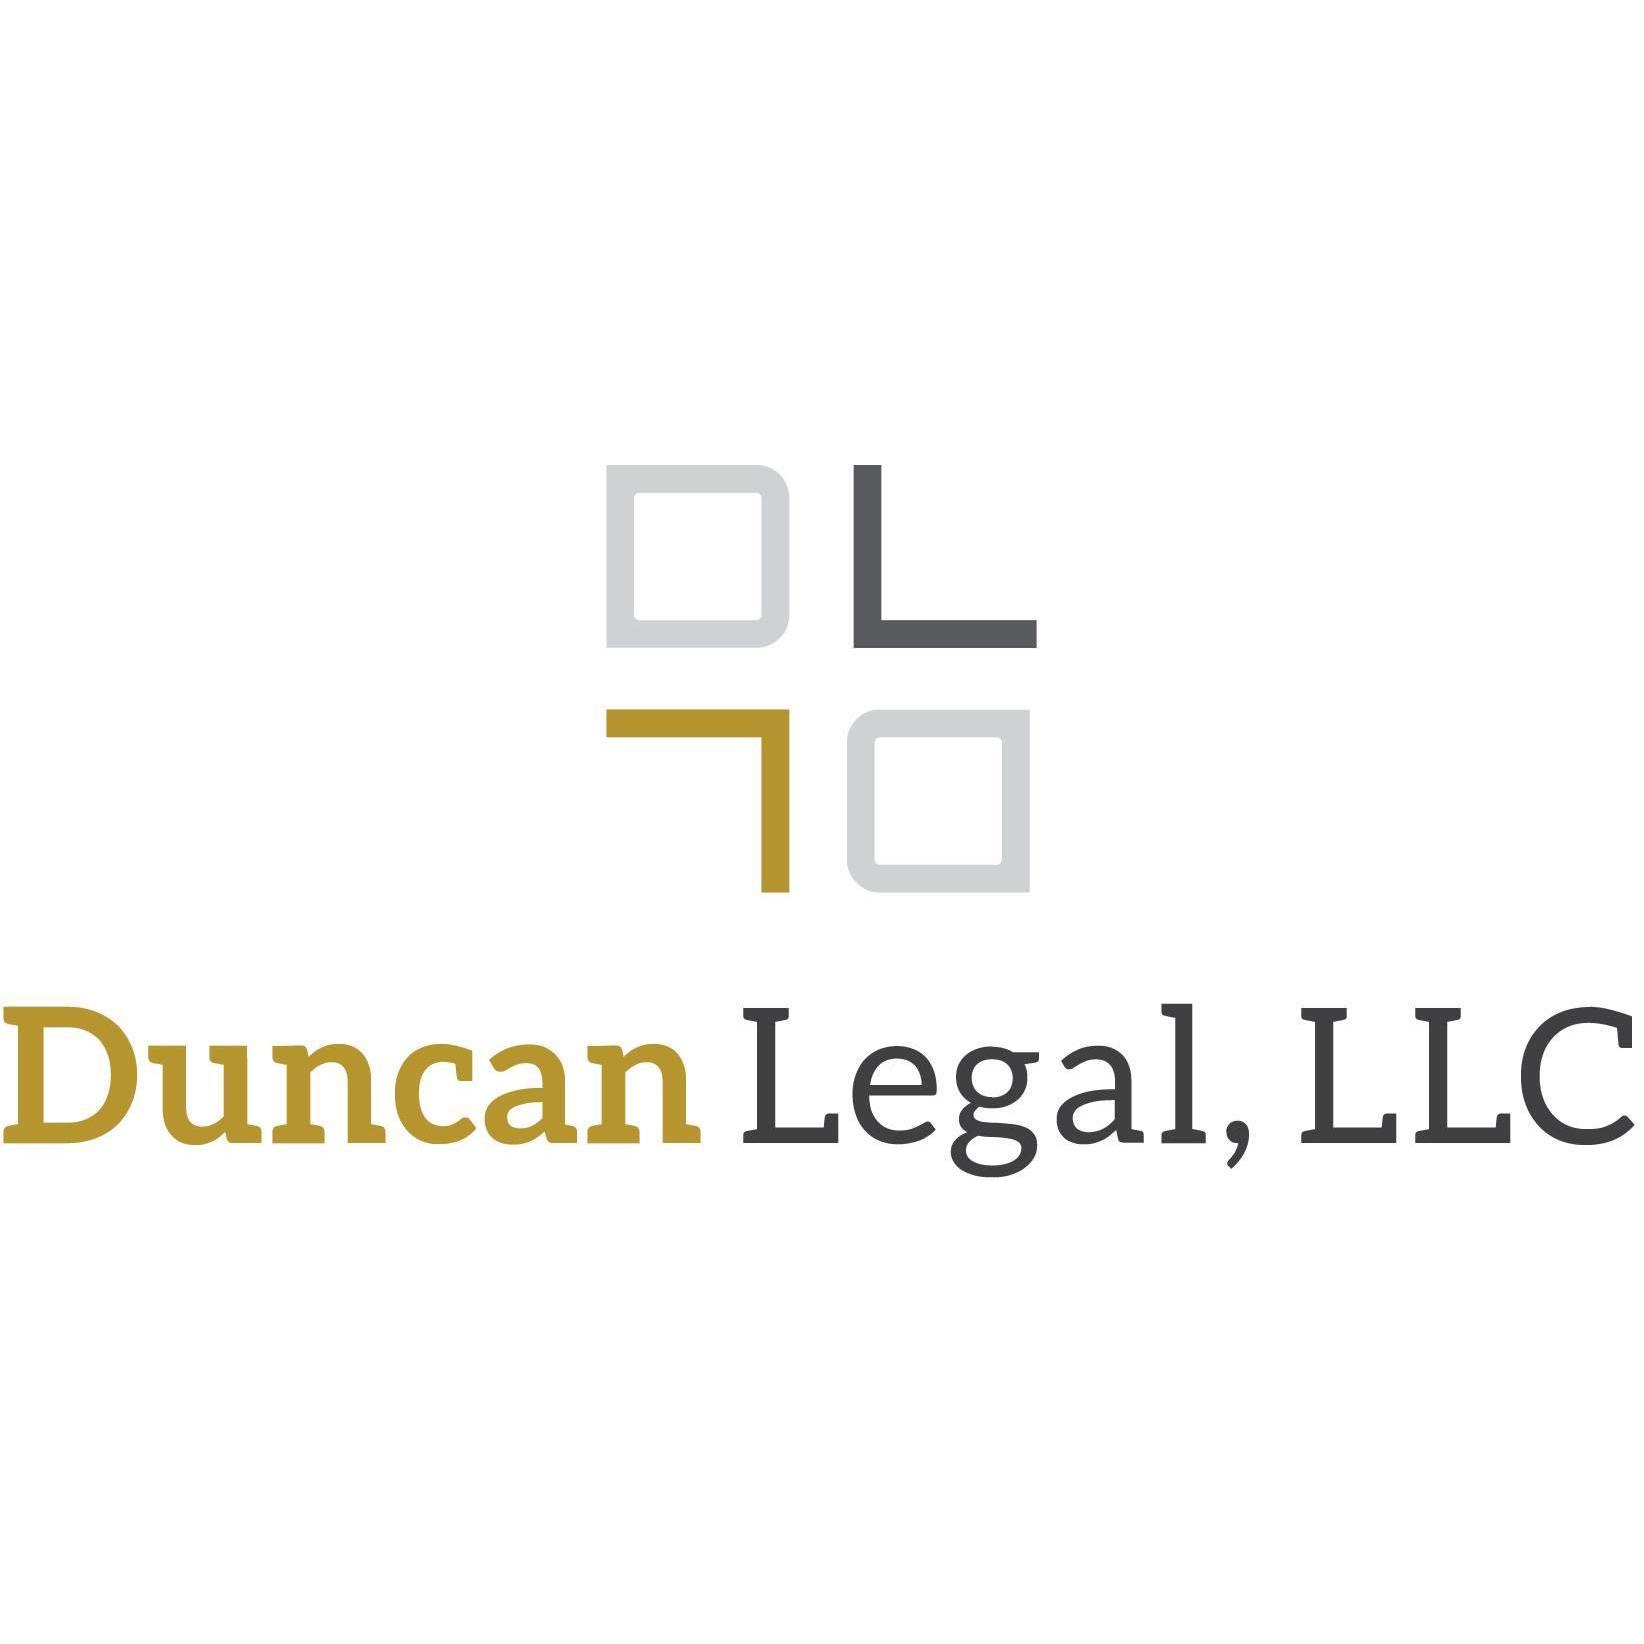 Duncan Legal, LLC image 1